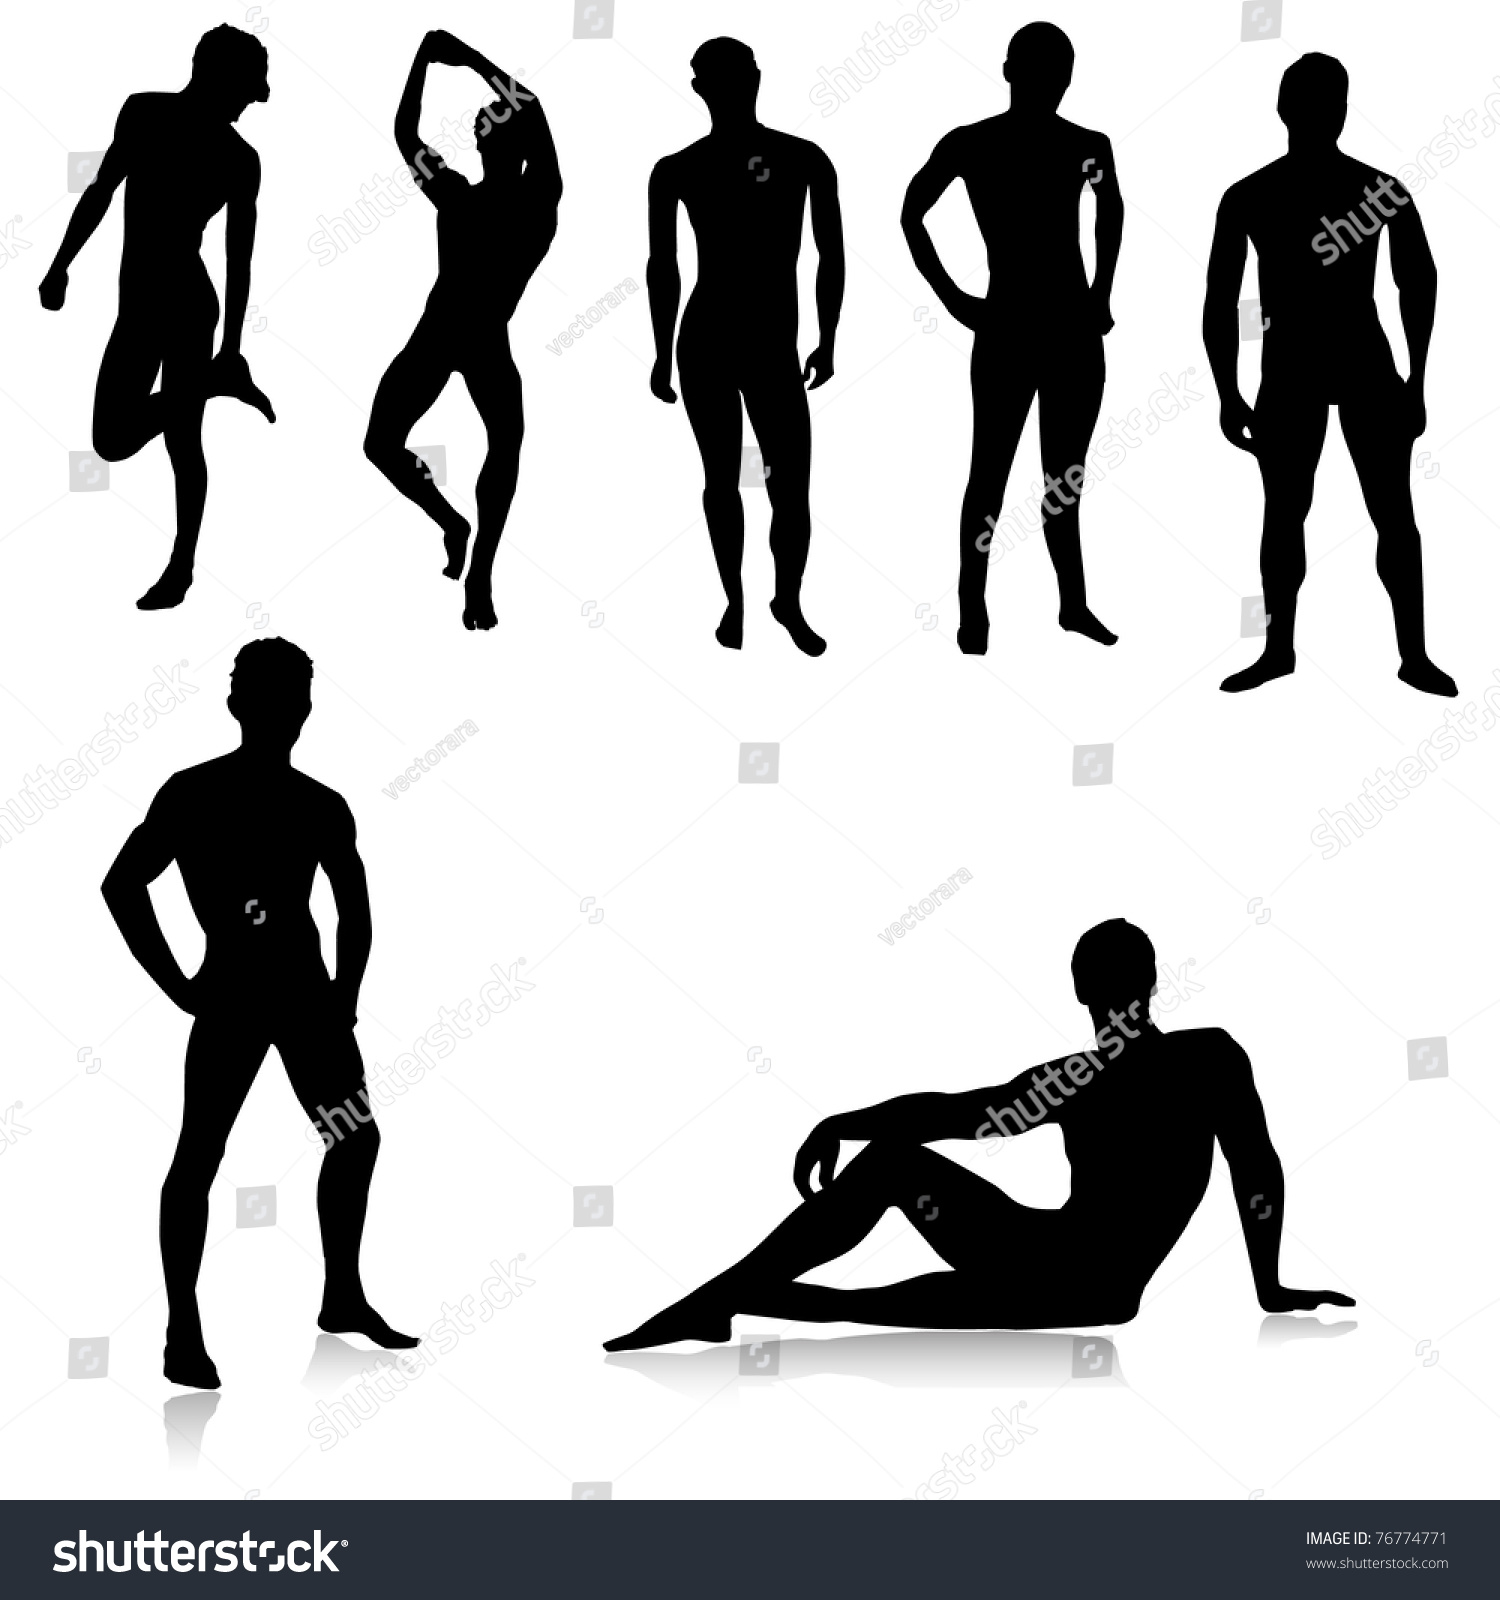 Silhouette Of A Male Stripper 111